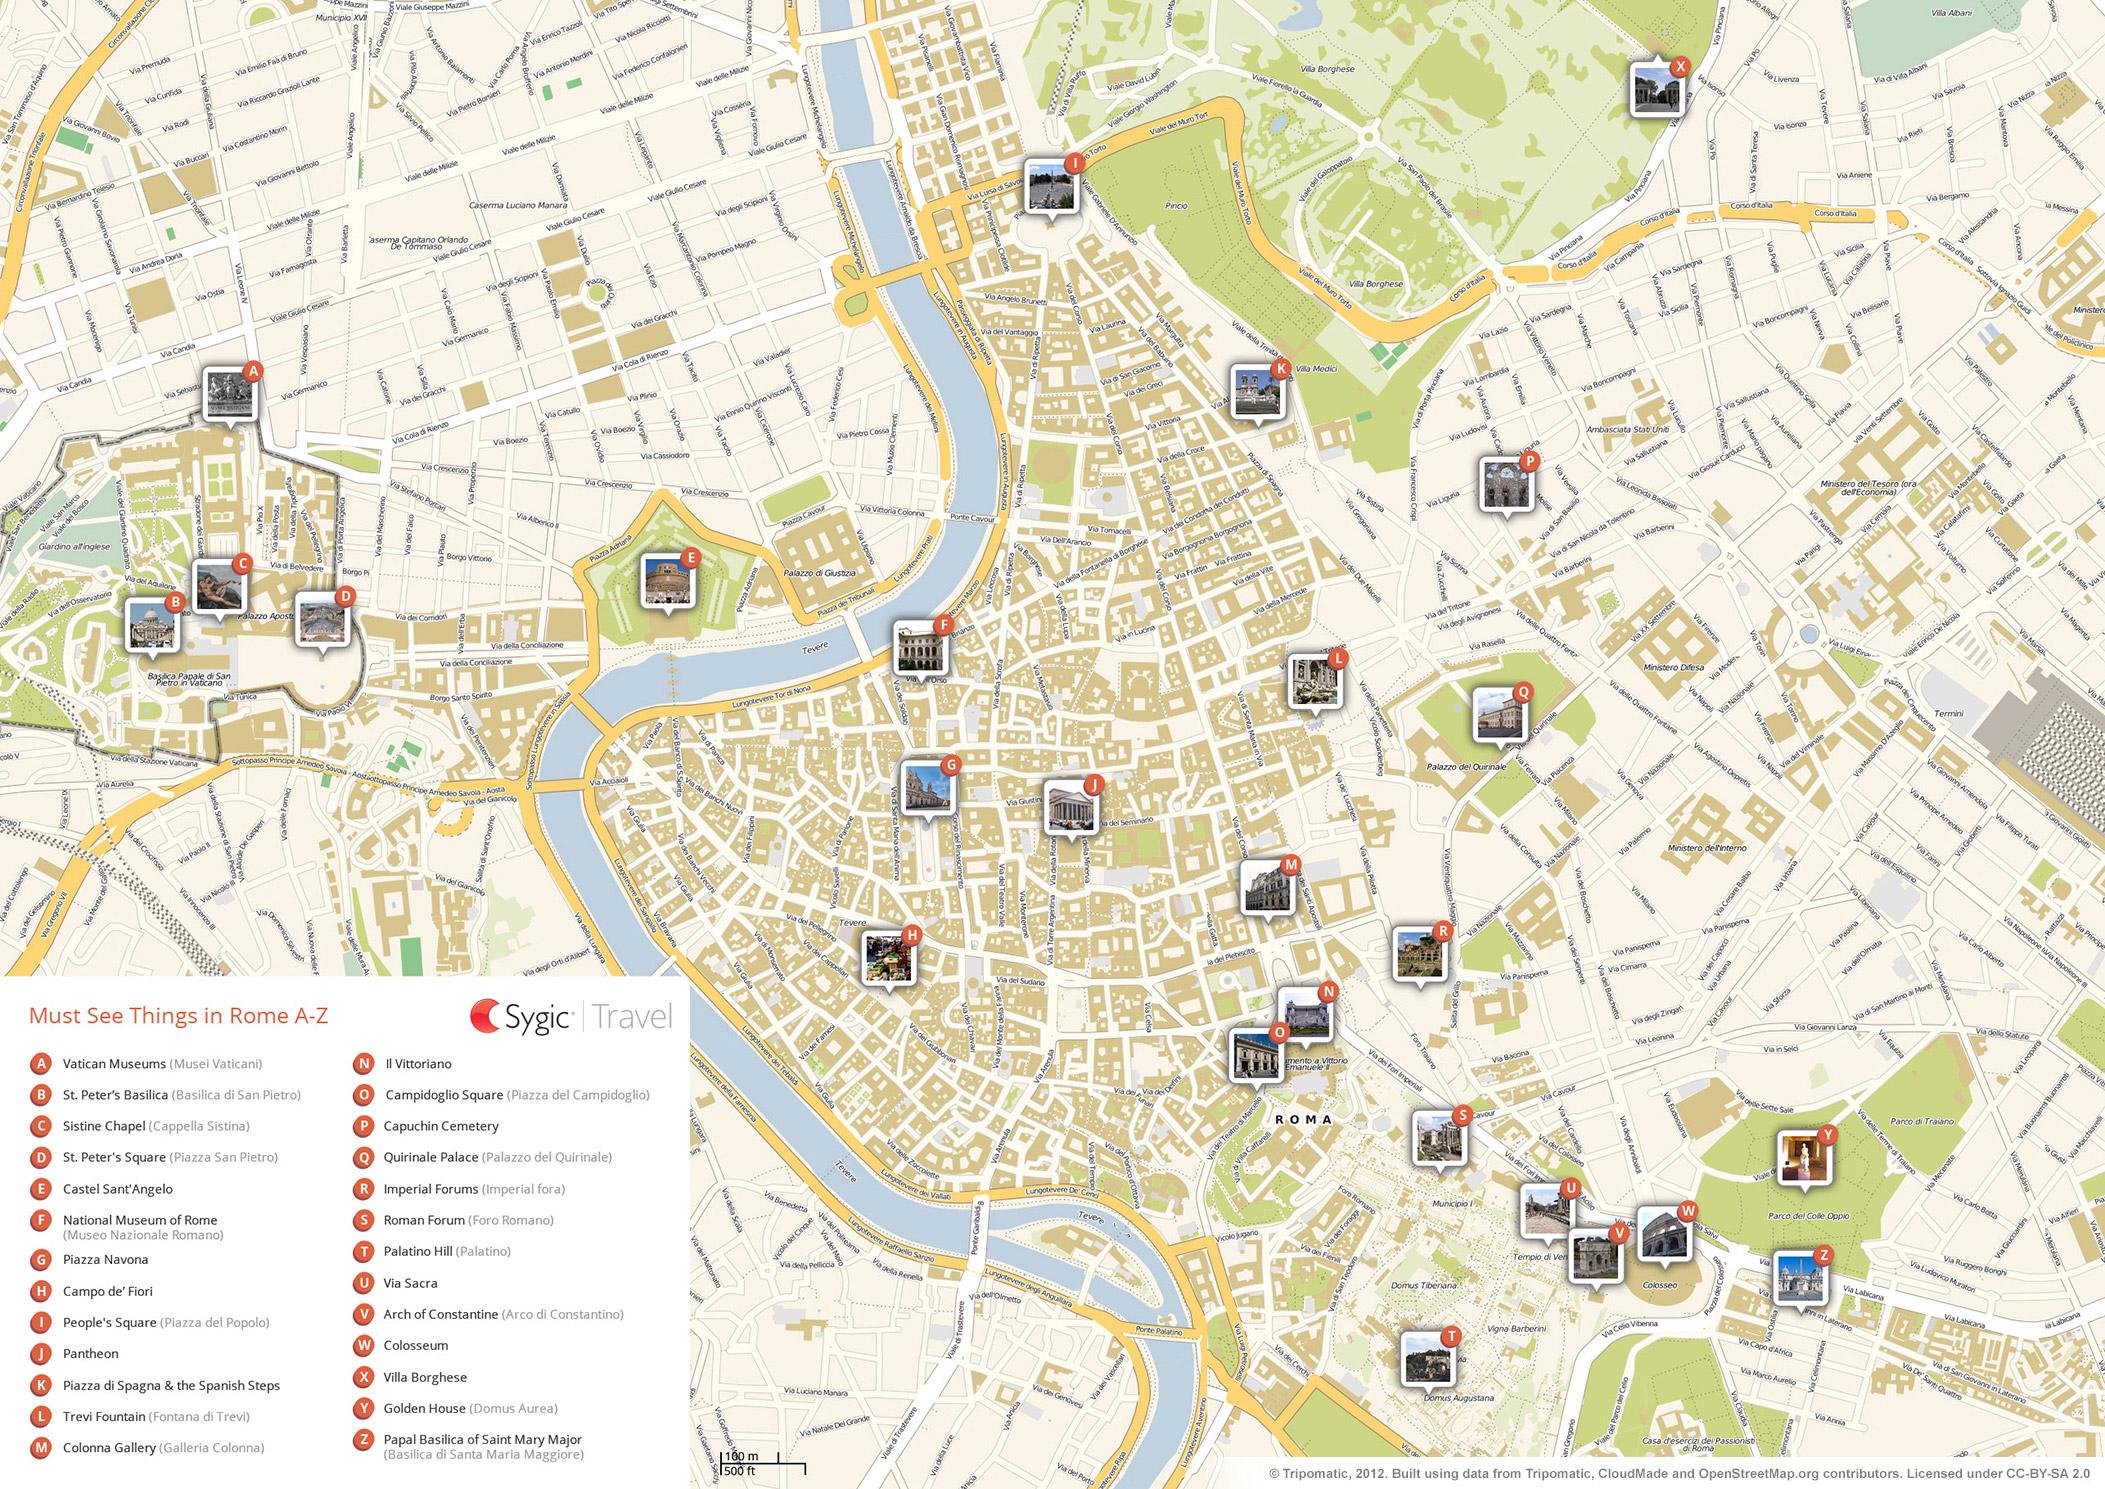 Rome Printable Tourist Map | Sygic Travel - Printable Walking Map Of Rome